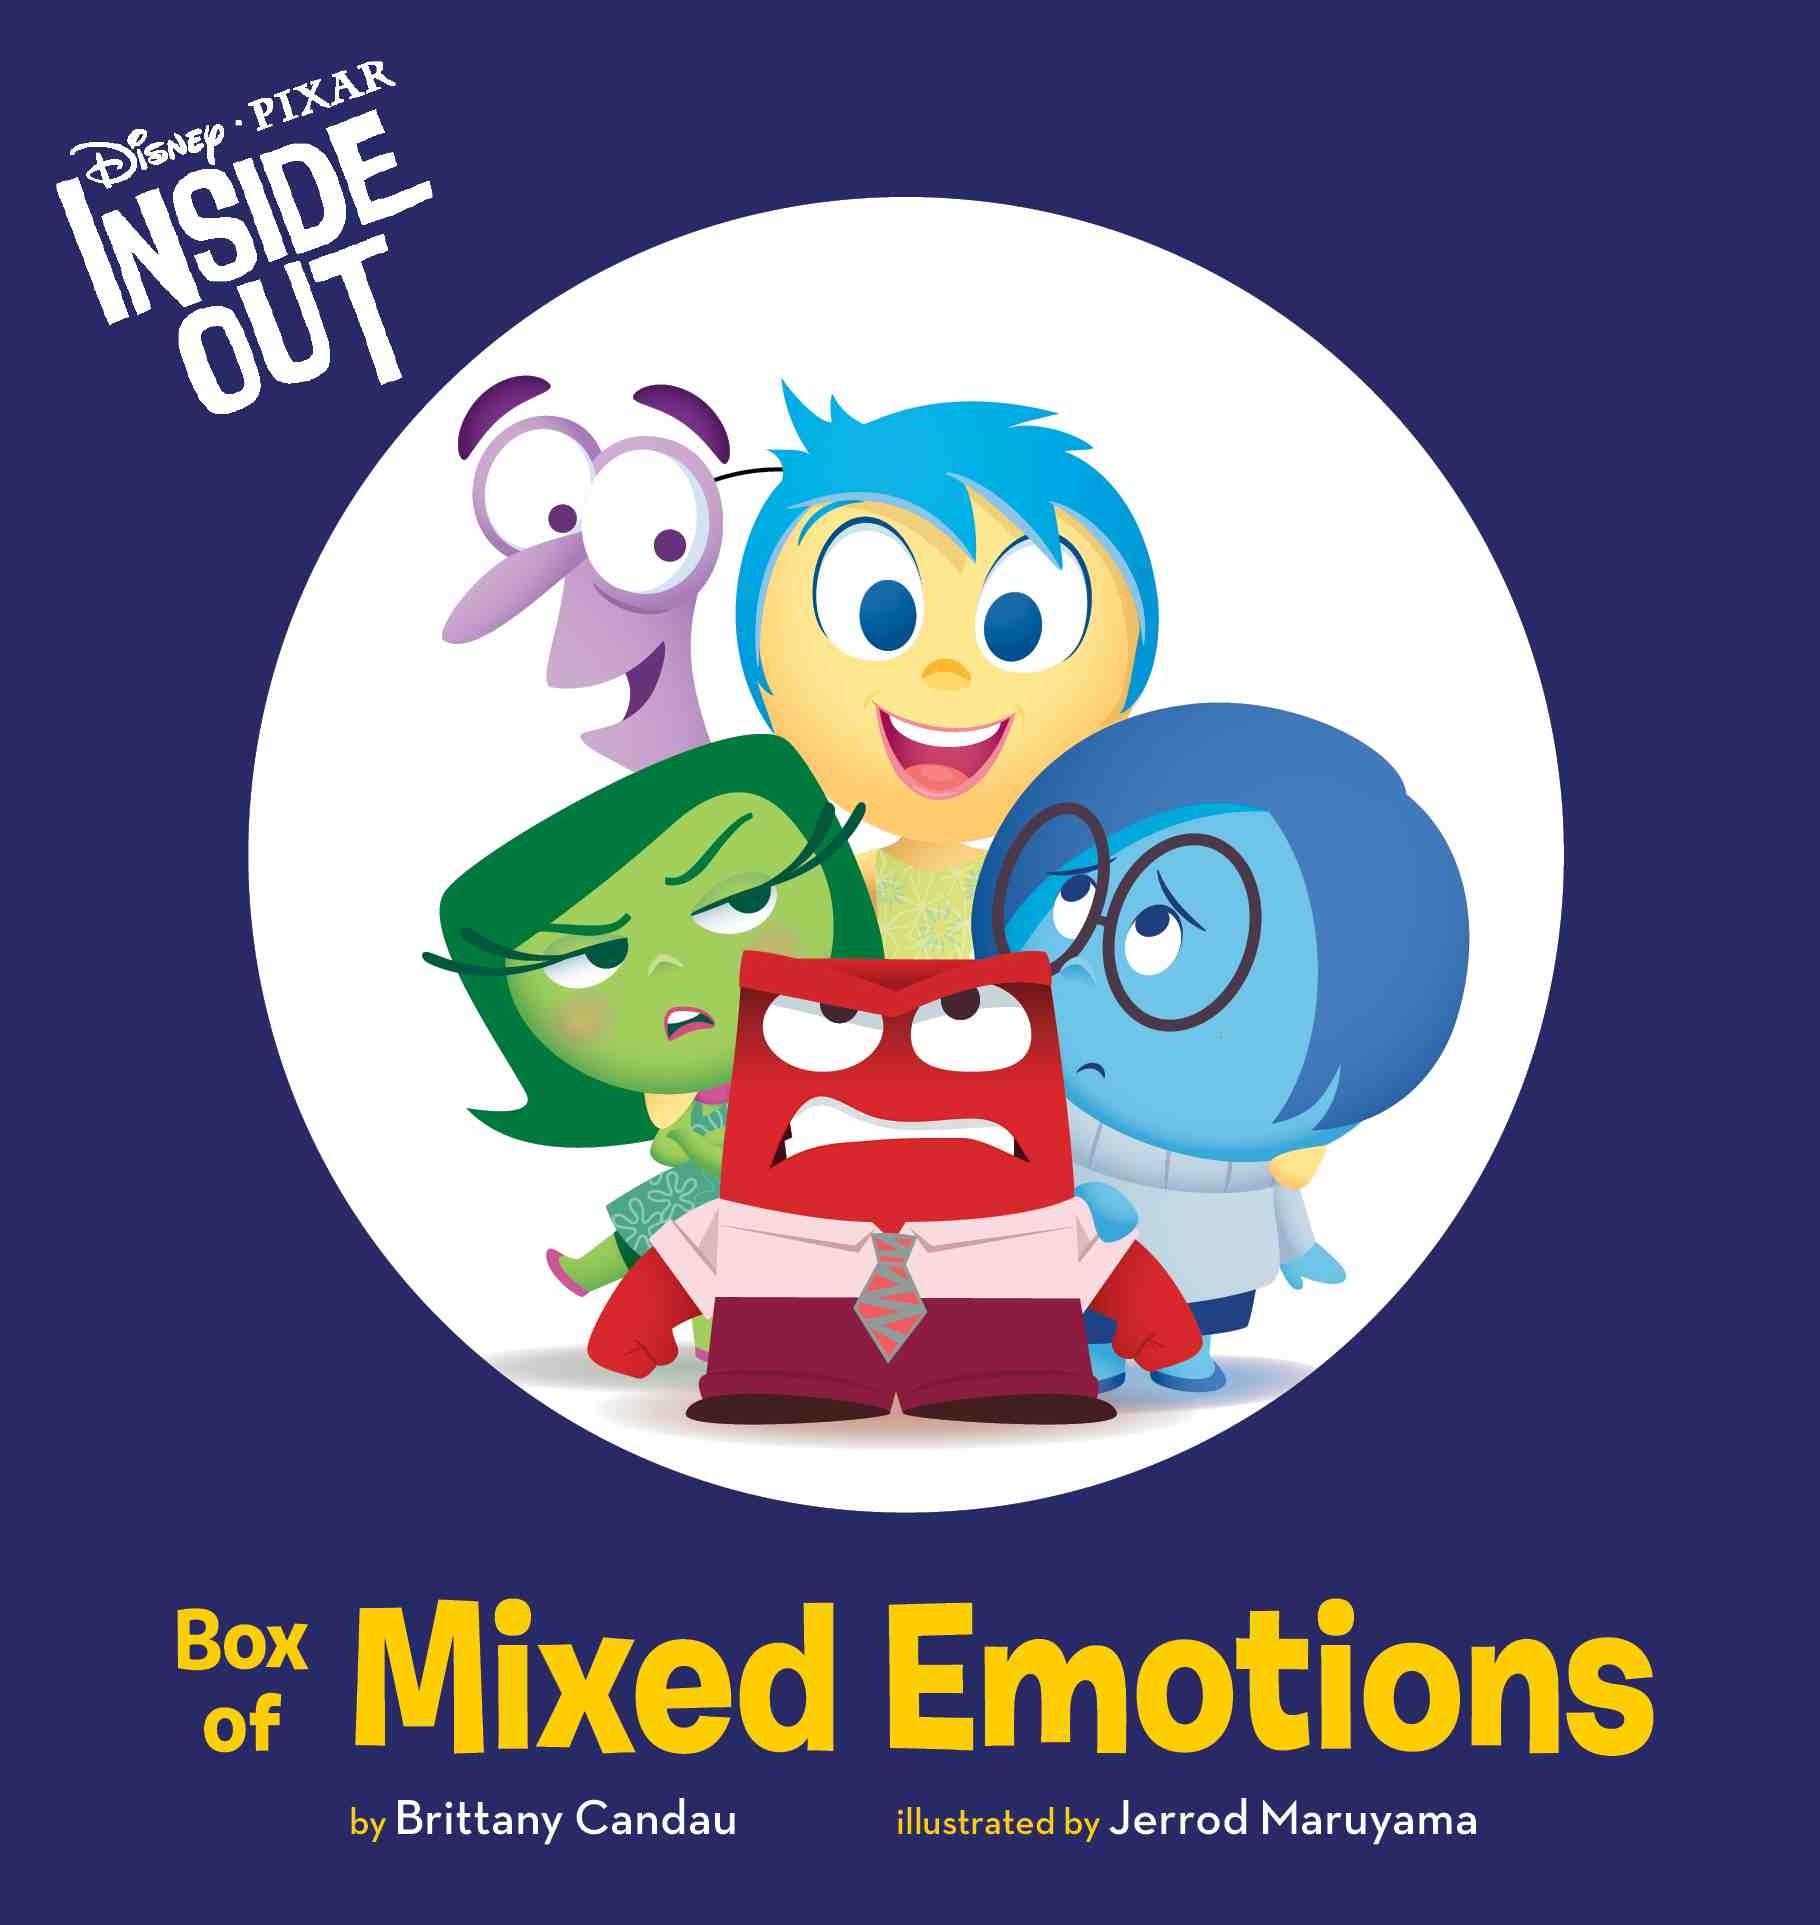 MixedEmotions_Maruyama_DisneyPixar.jpg